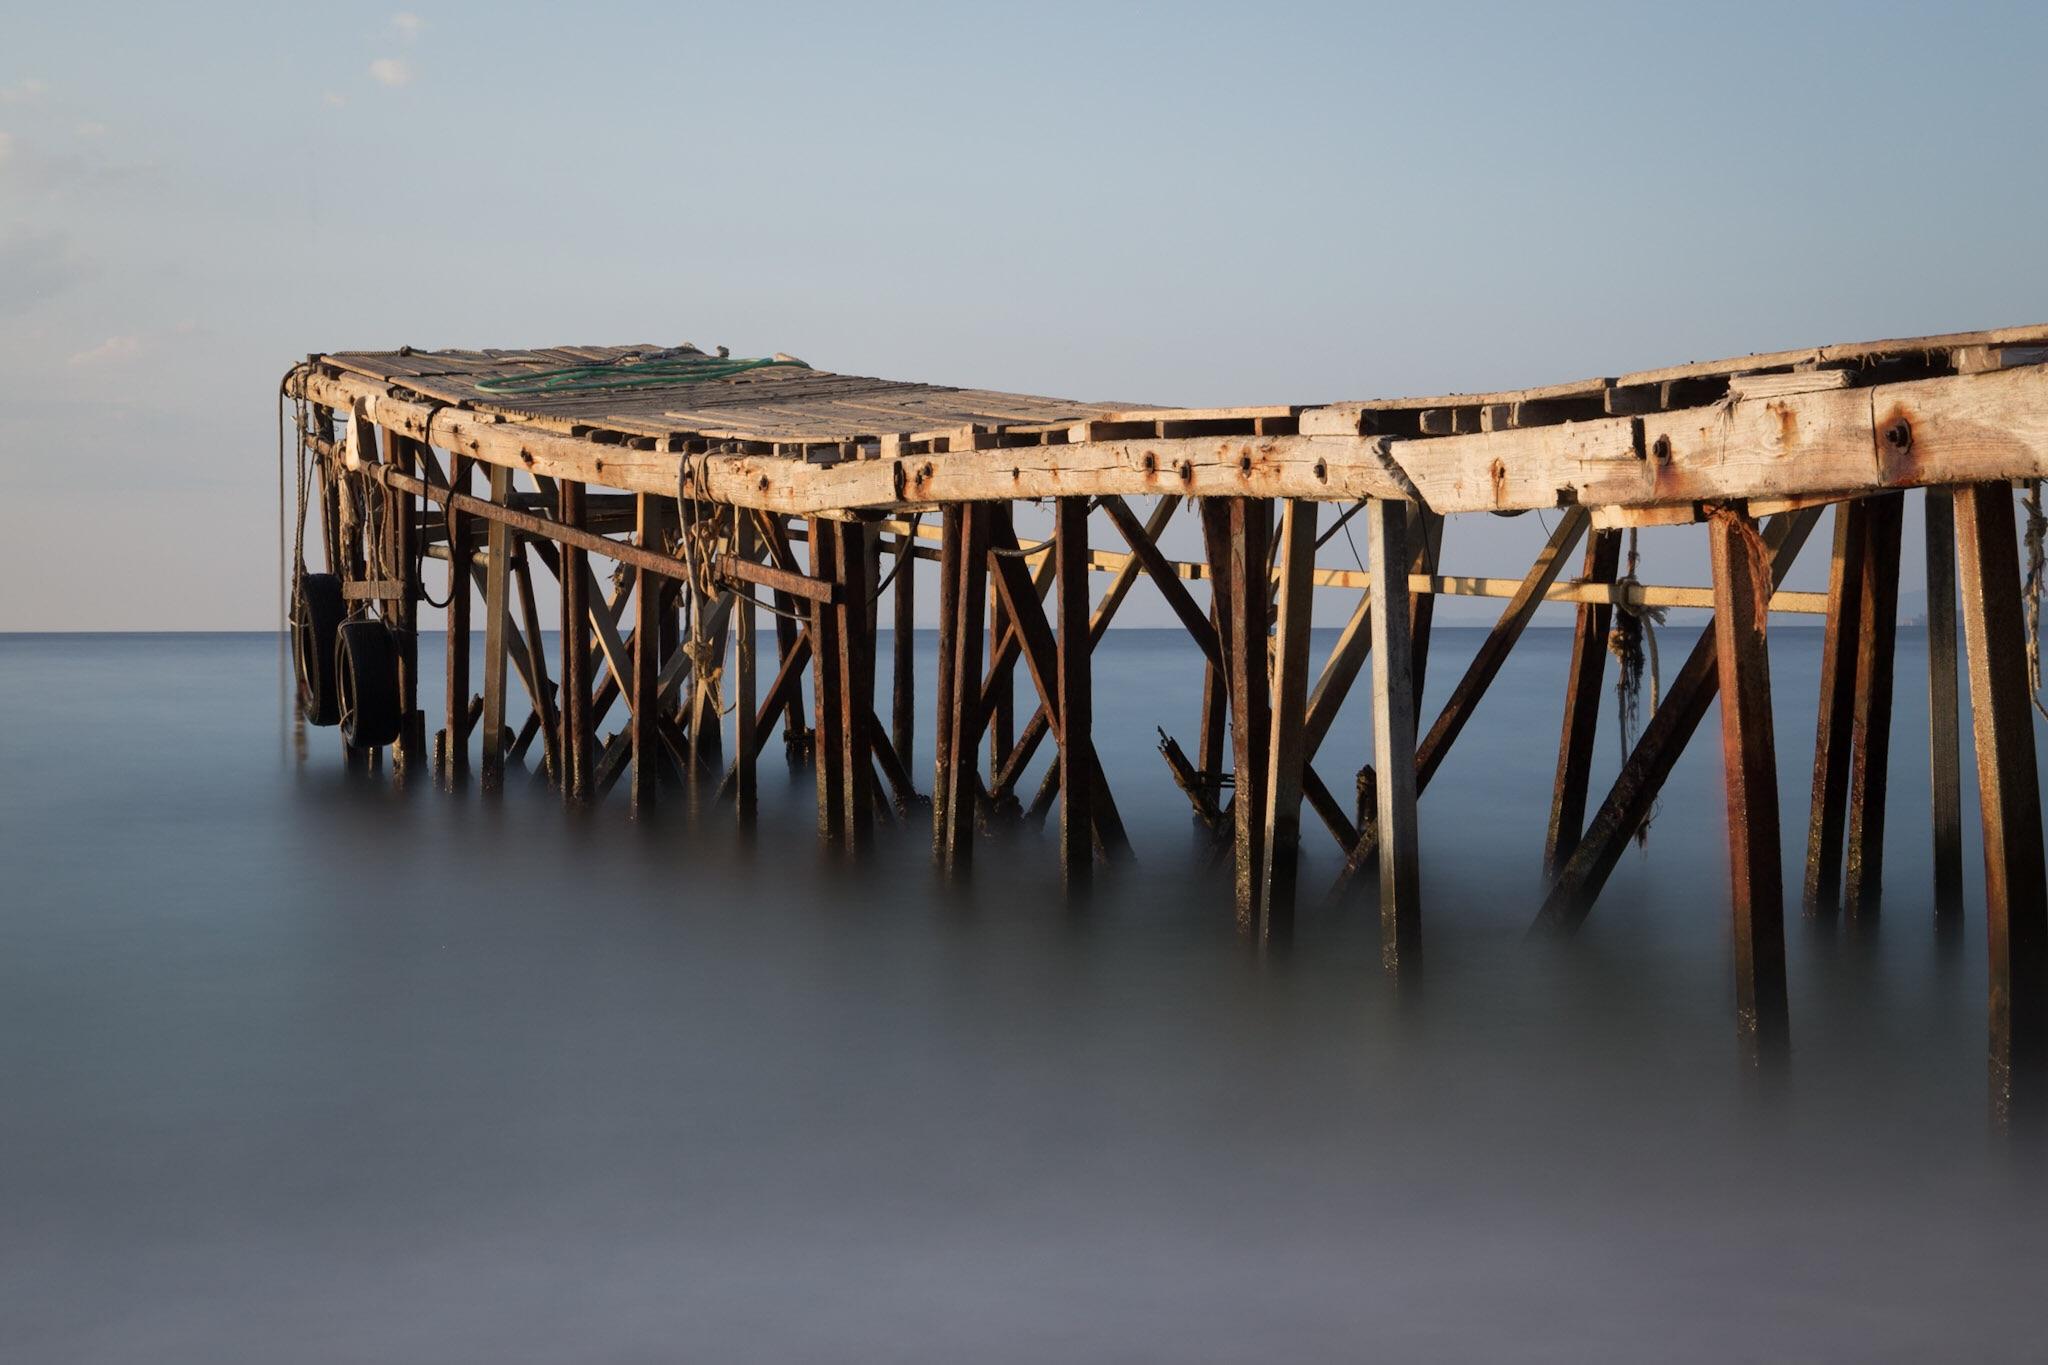 Picture of the wooden jetty, Nissaki Beach, Corfu, Greece